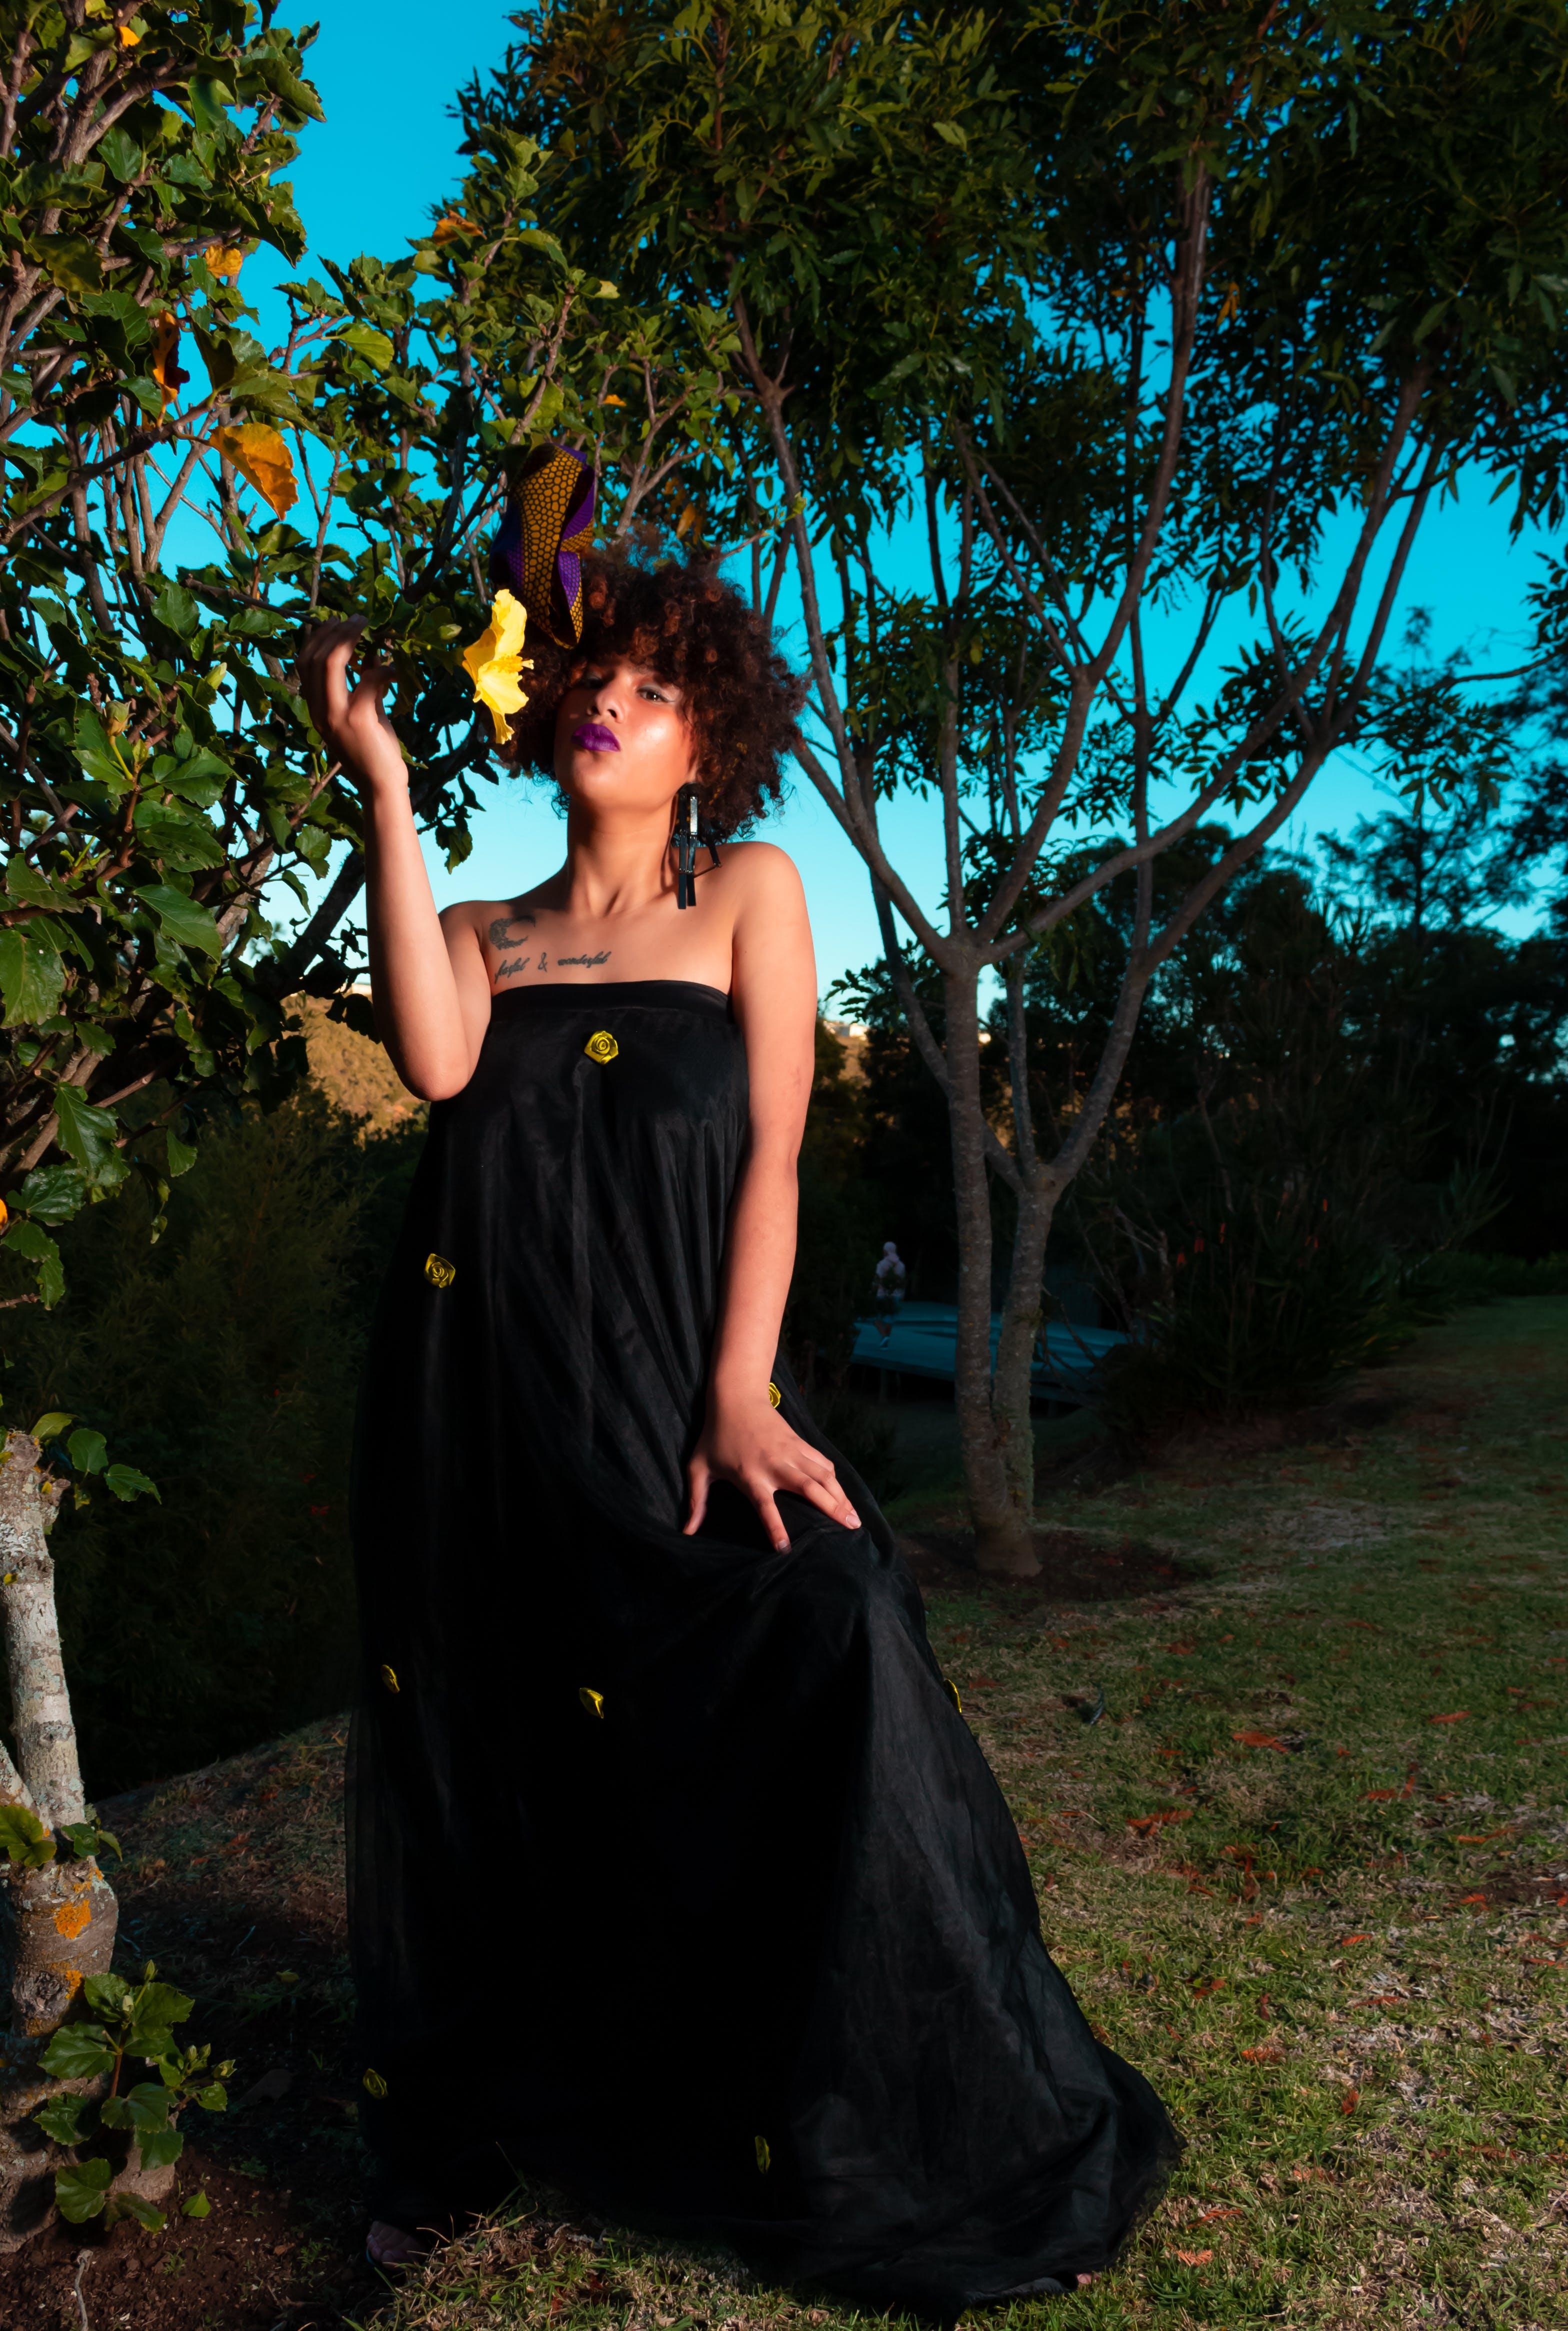 Woman Wearing Black Tube Long Dress